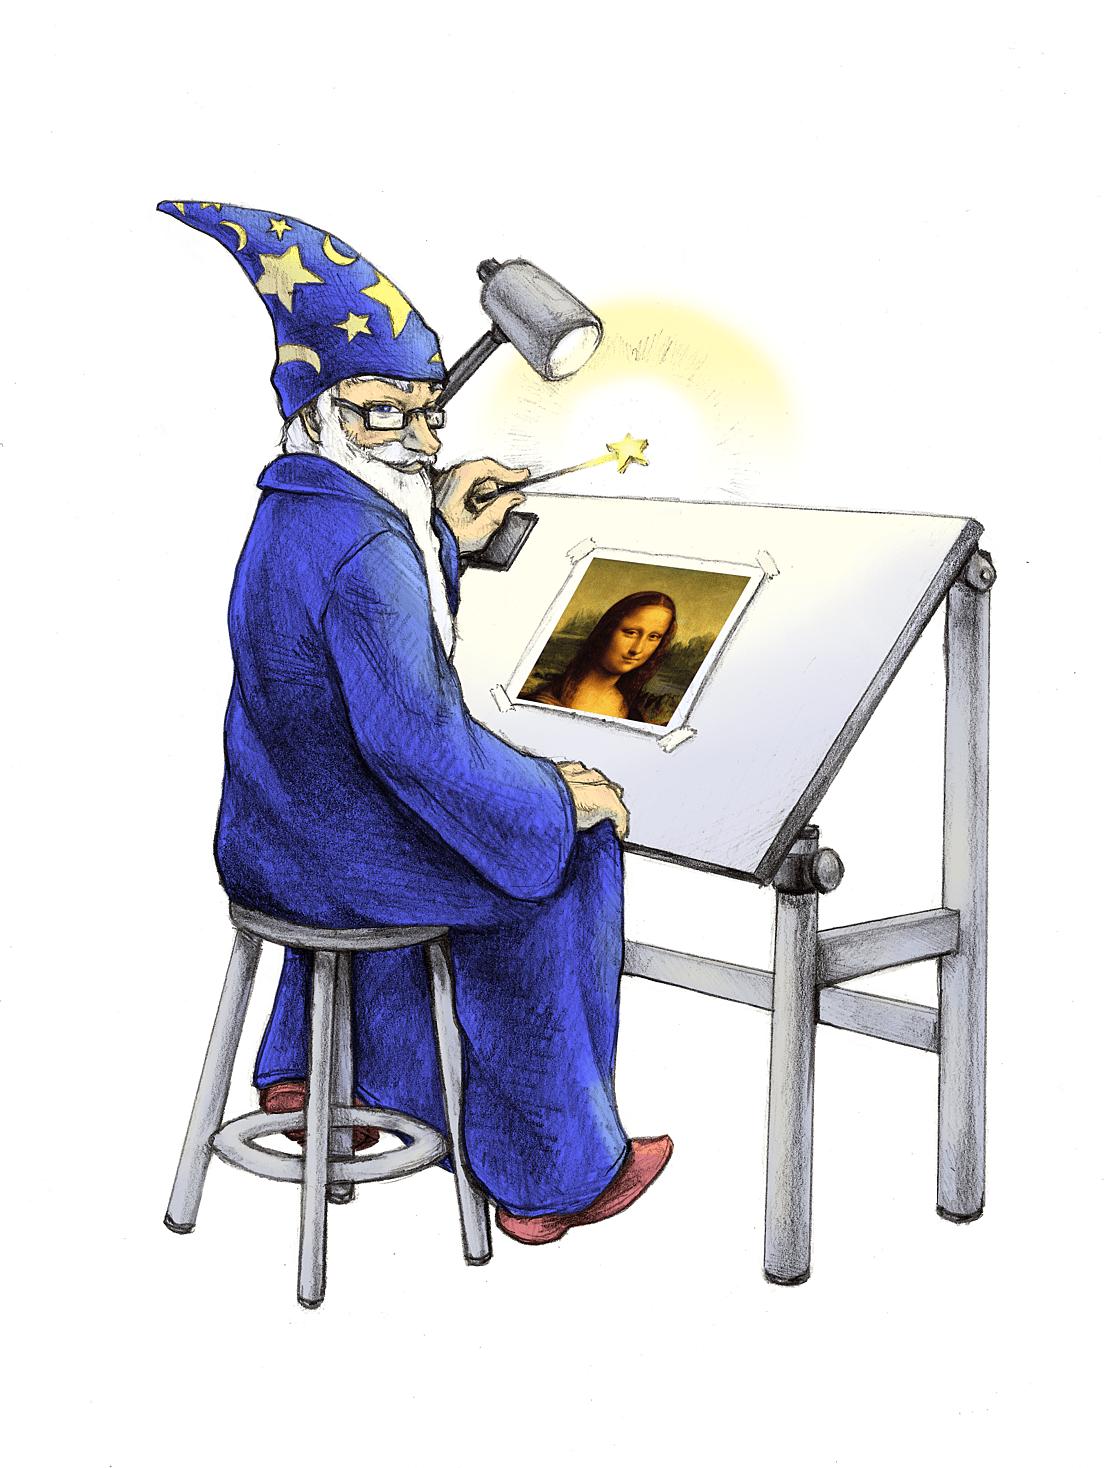 ImageMagick wizard